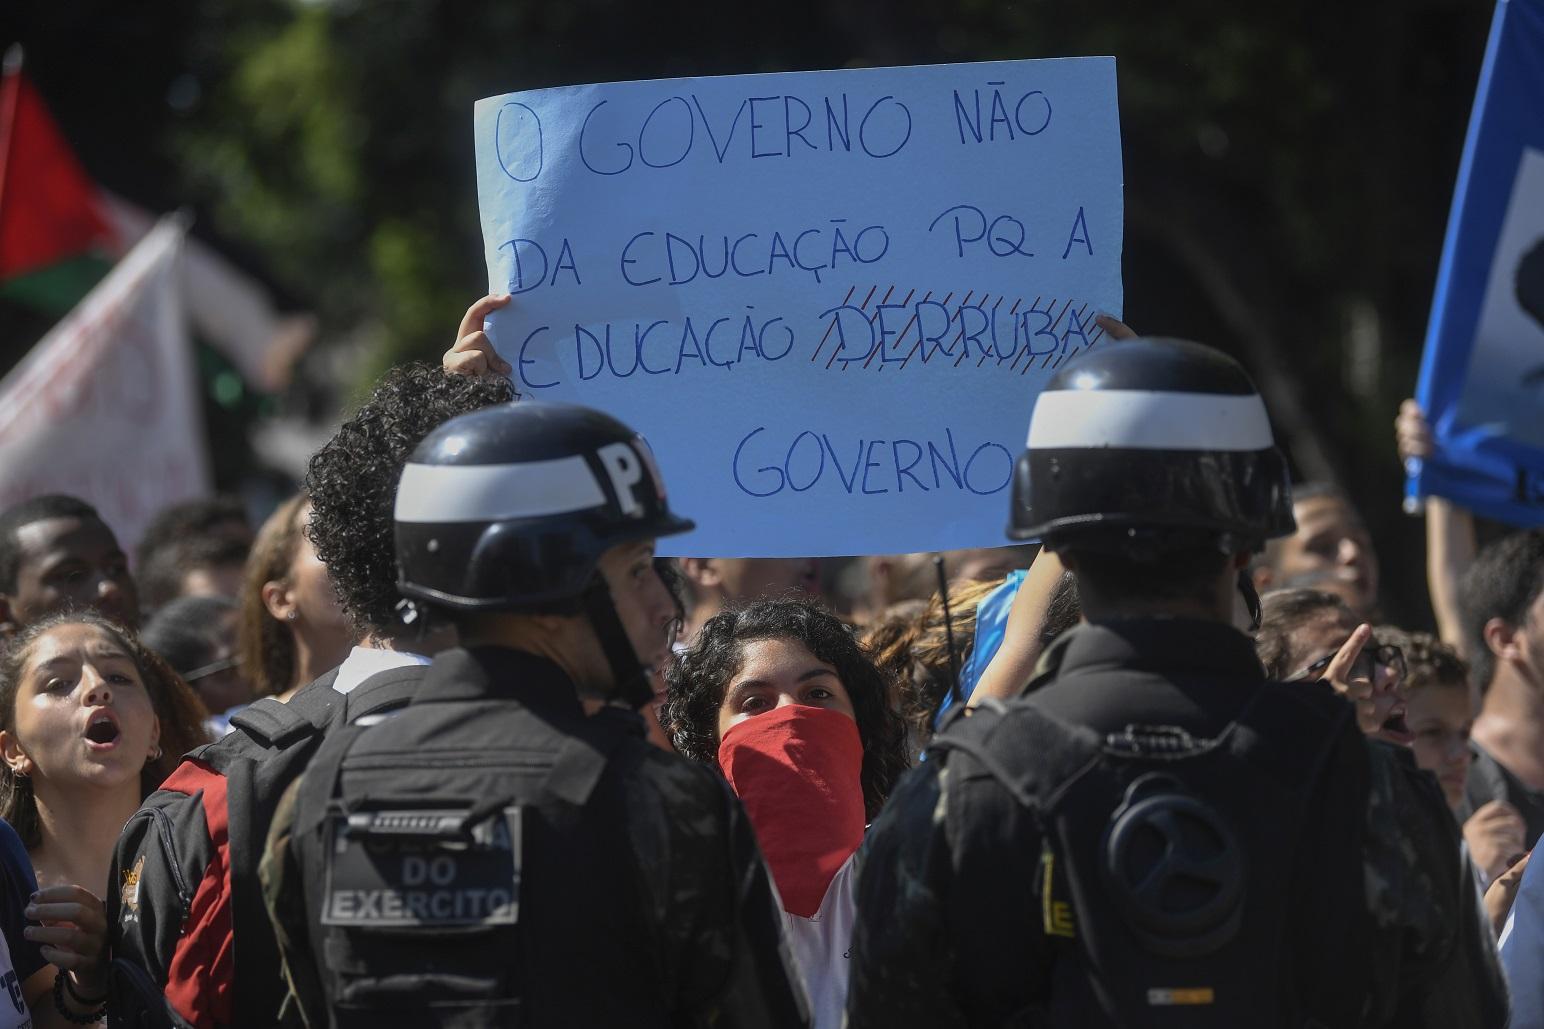 Estudantes protestam no Rio contra os cortes de verbas para as universidades públicas. Foto Mauro Pimentel/AFP